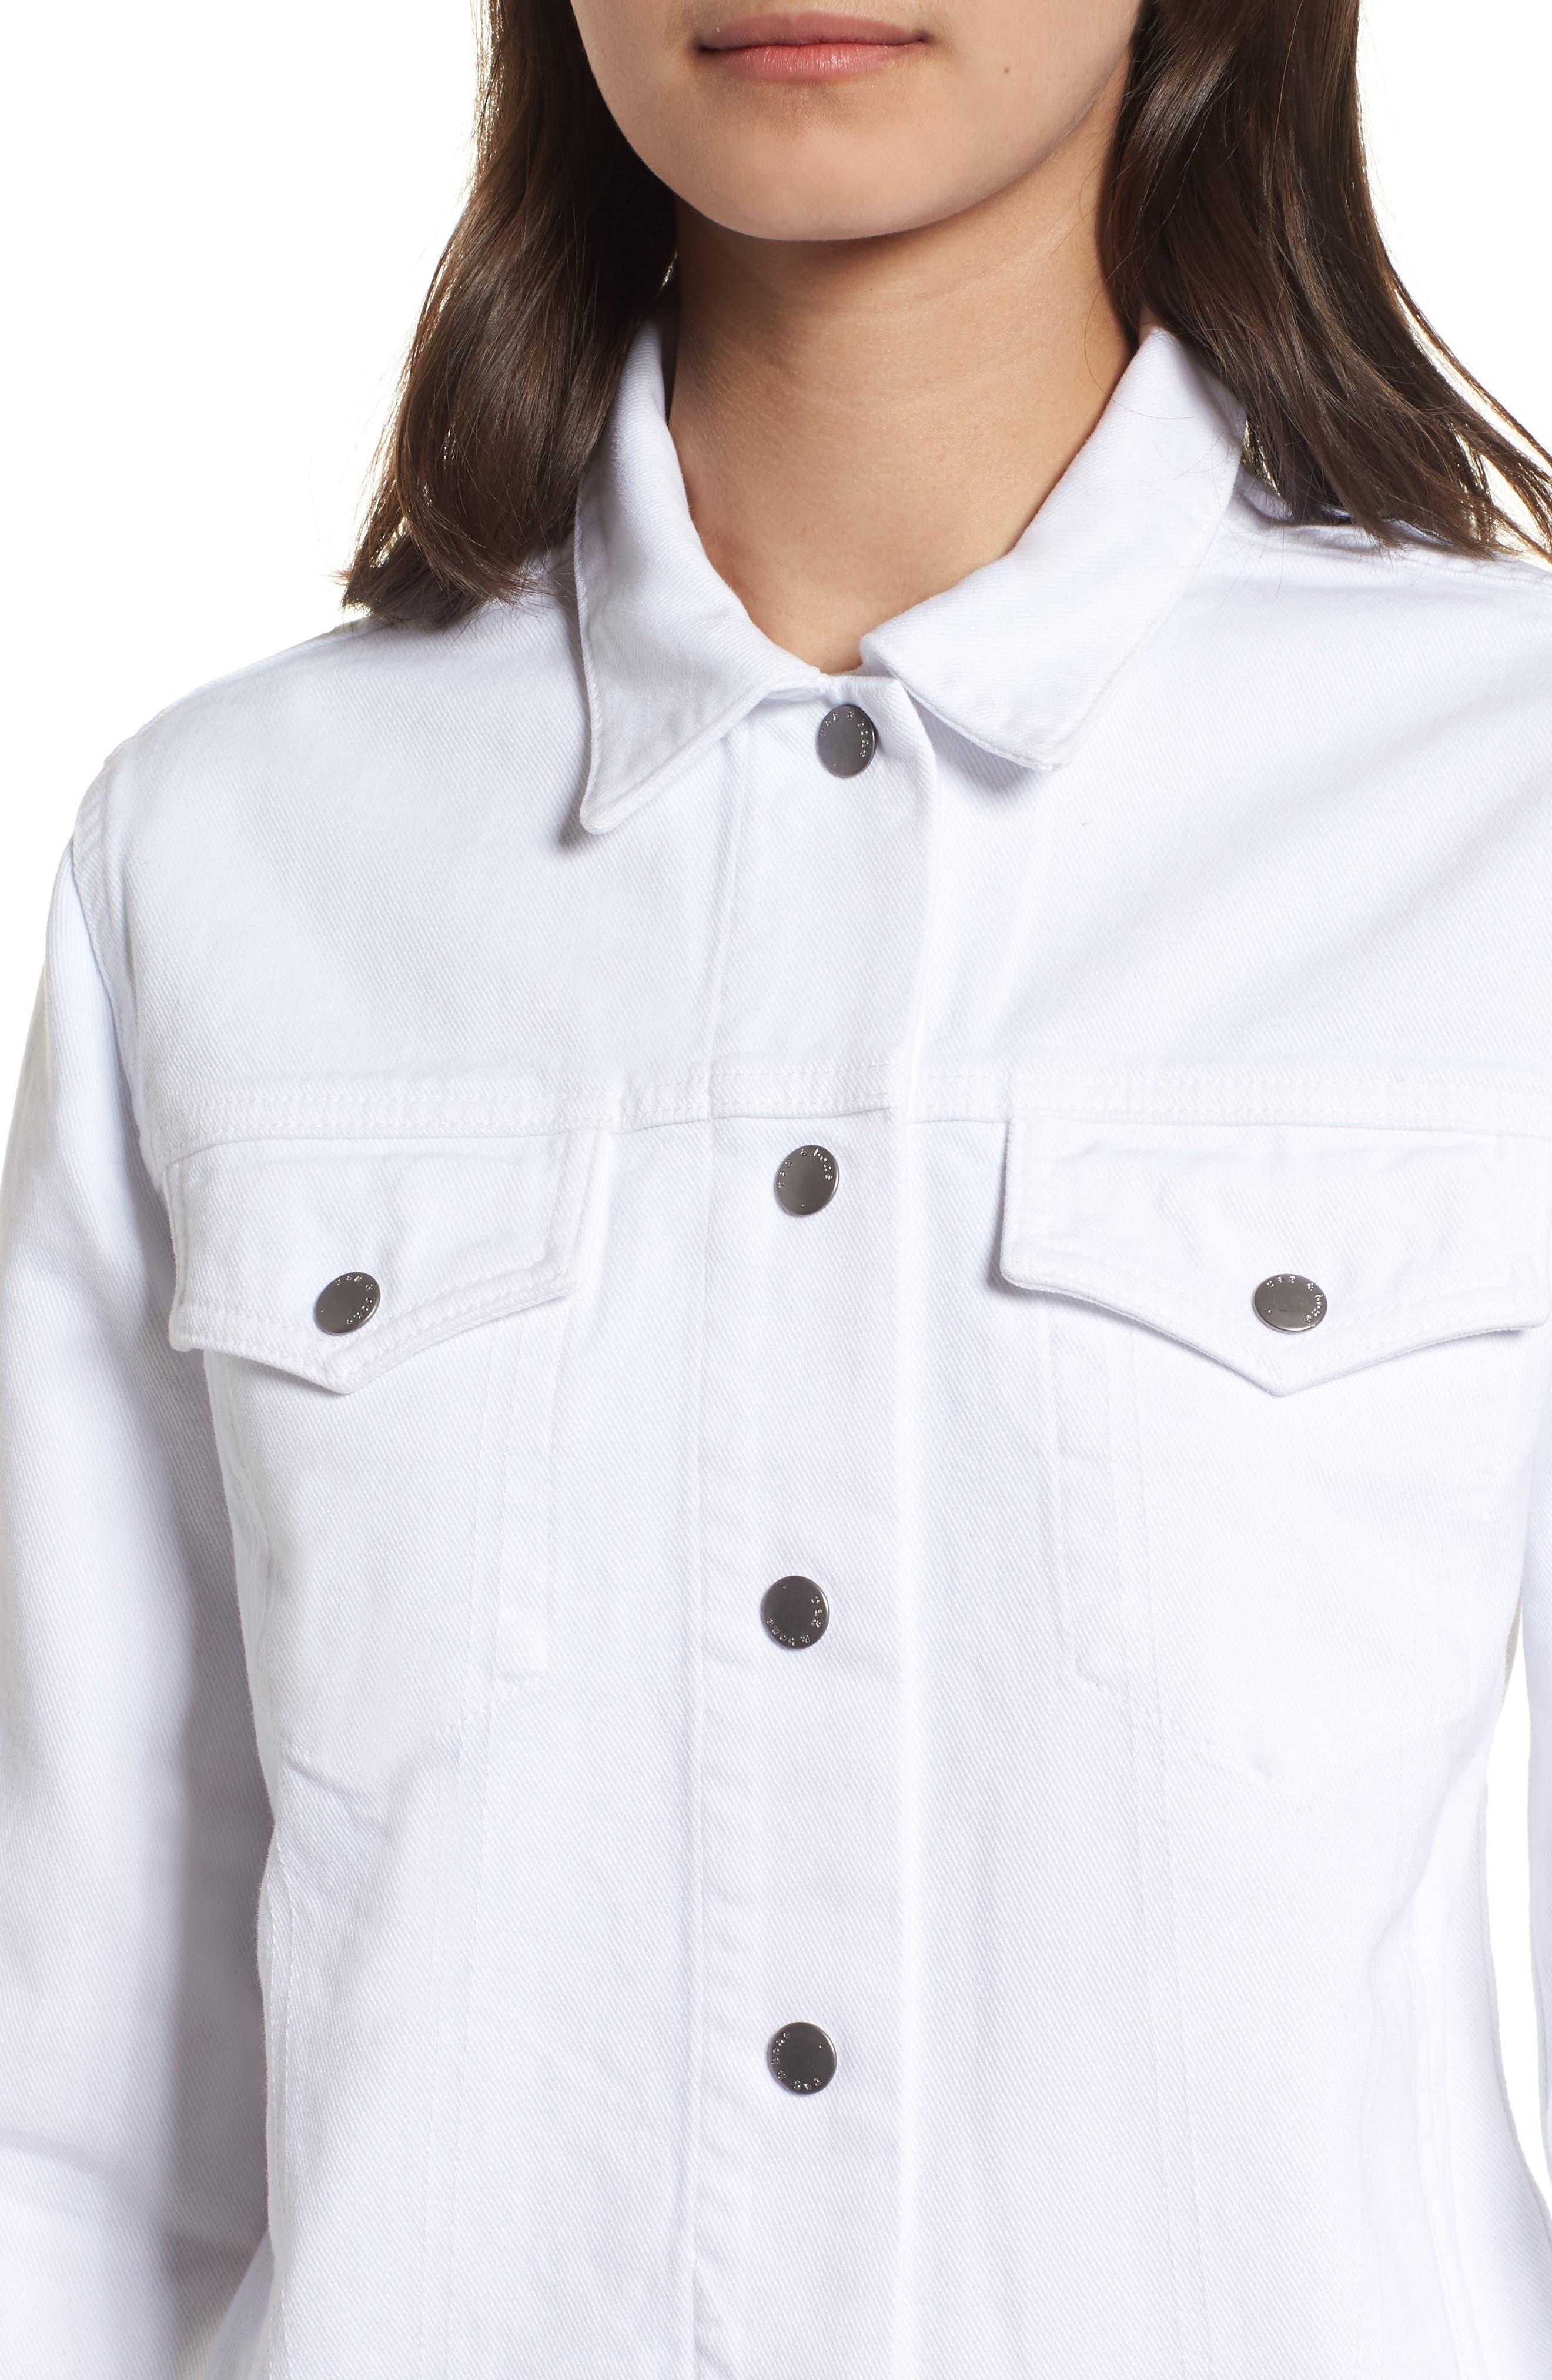 Nico Denim Jacket,                             Alternate thumbnail 4, color,                             White